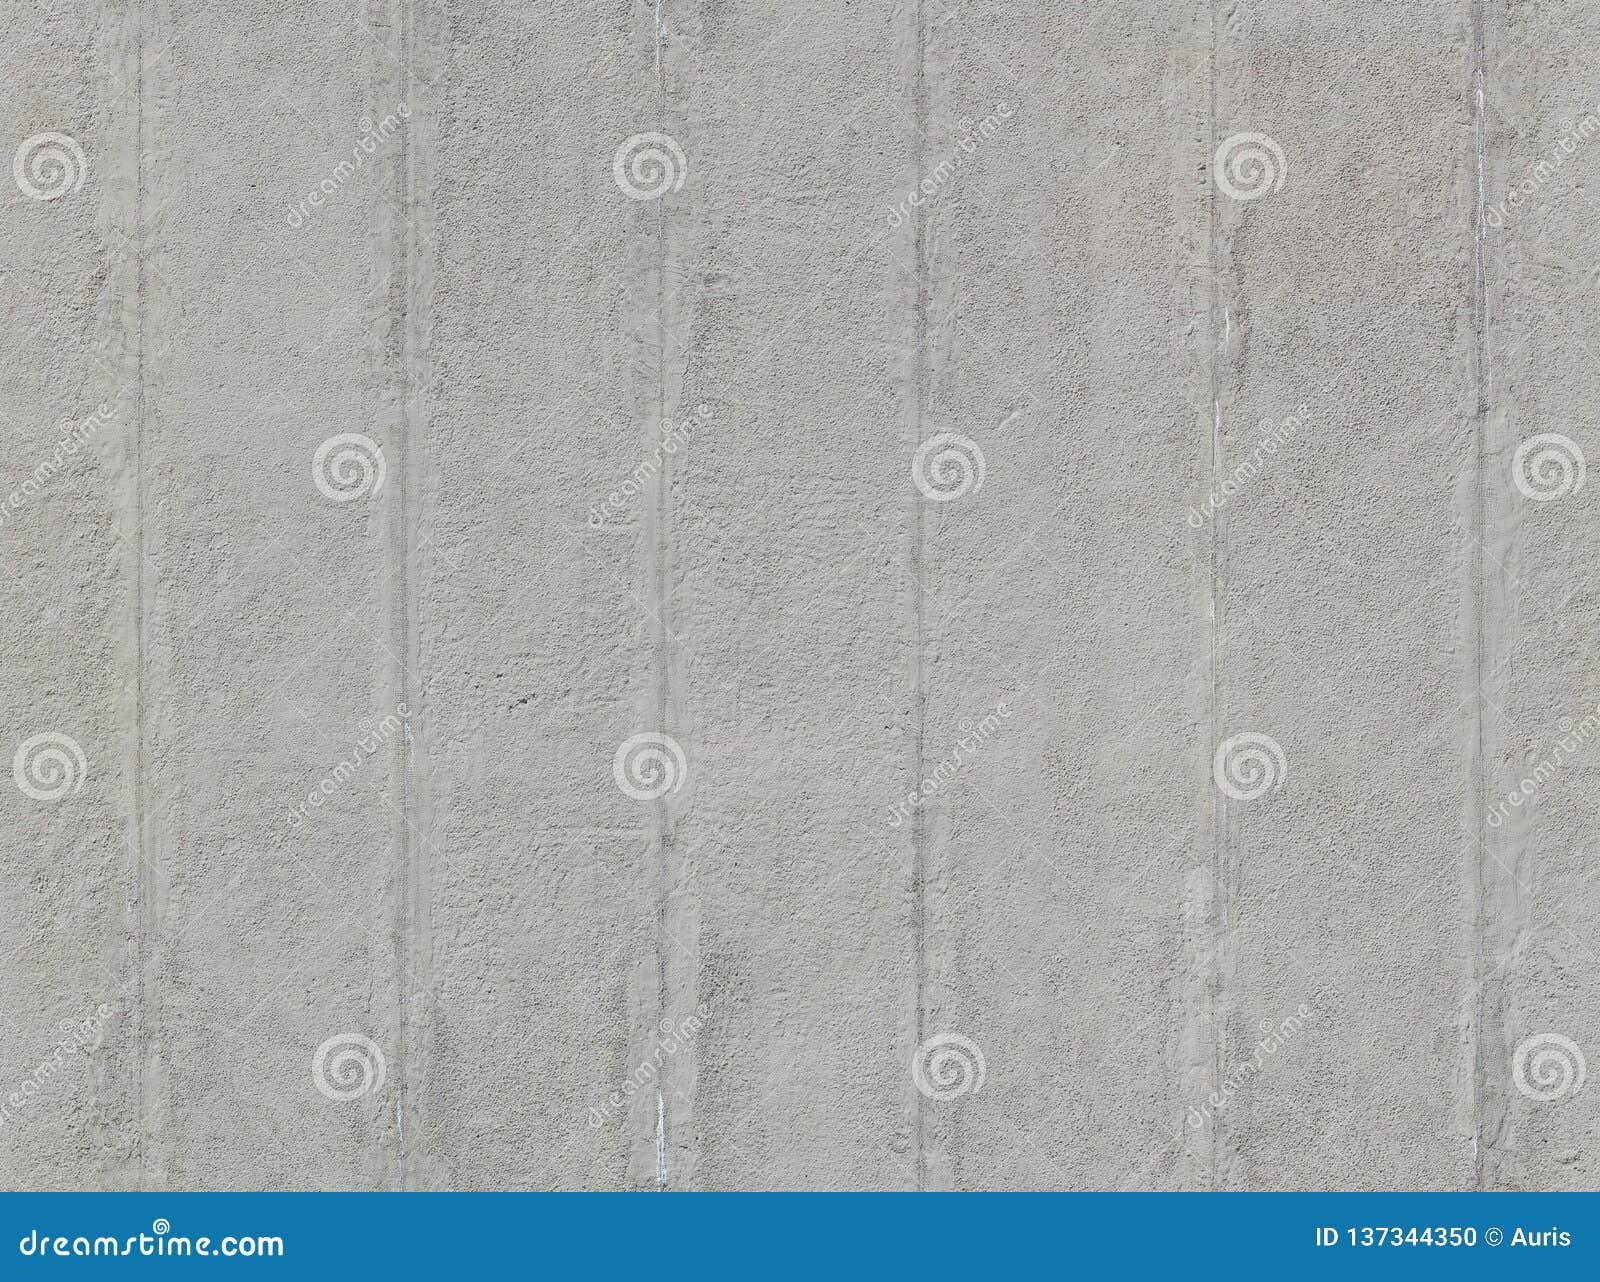 Seamless concrete wall texture